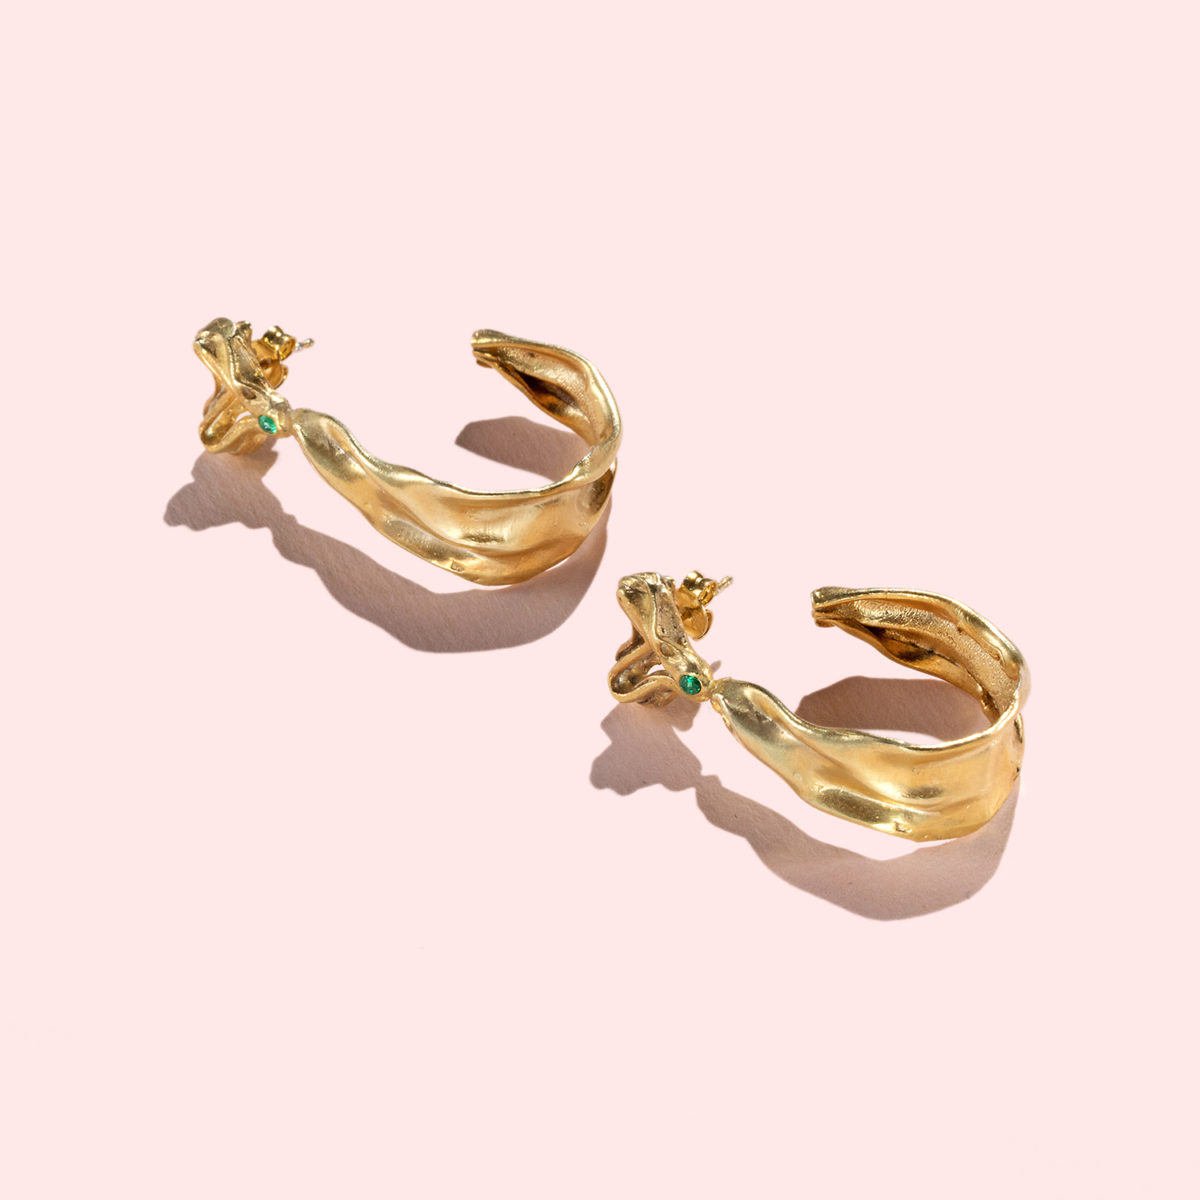 Ohrringe-Athena-Luxus-Silber-925-Gold-24k